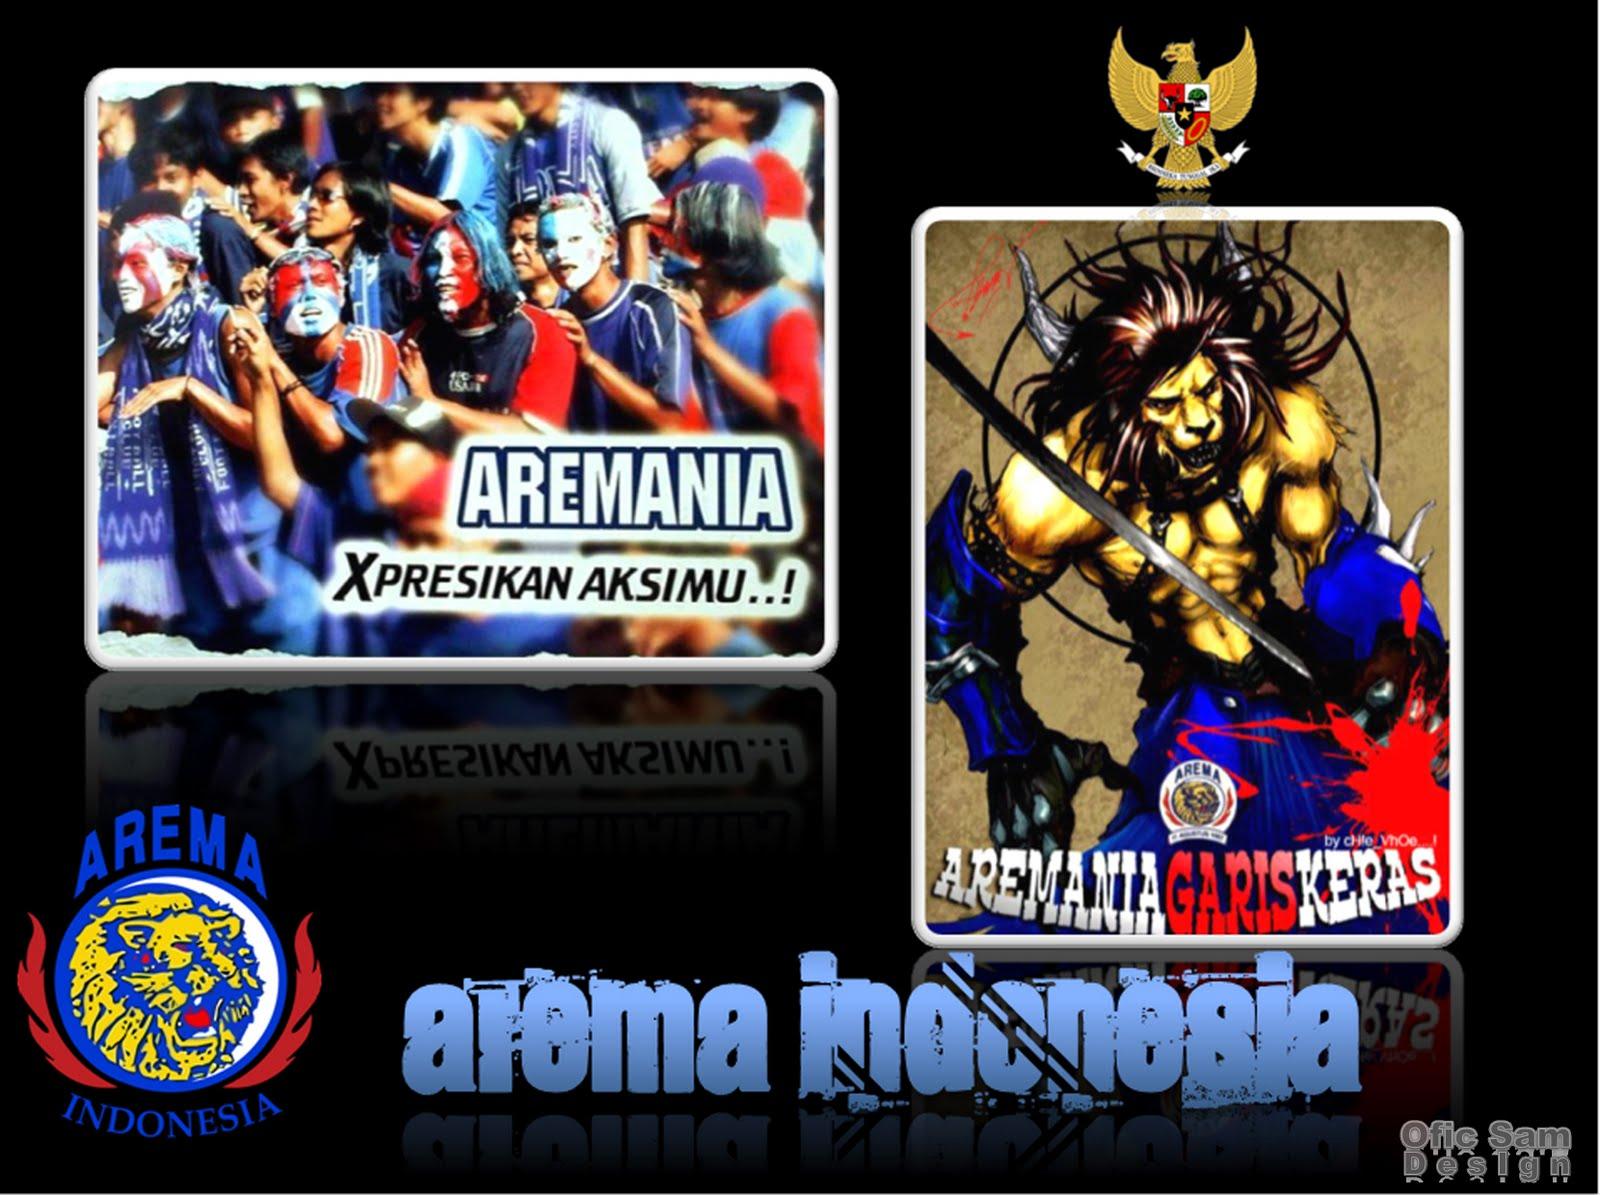 http://3.bp.blogspot.com/-vNQD3X5OrUs/Tb-KX59LlgI/AAAAAAAAAJ8/yJh4RB-kL20/s1600/wallpaper+arema+indonesia+mei+2011+by+ofic+sam+_boy_gassipers@yahoo.co.id+%2812%29.jpg